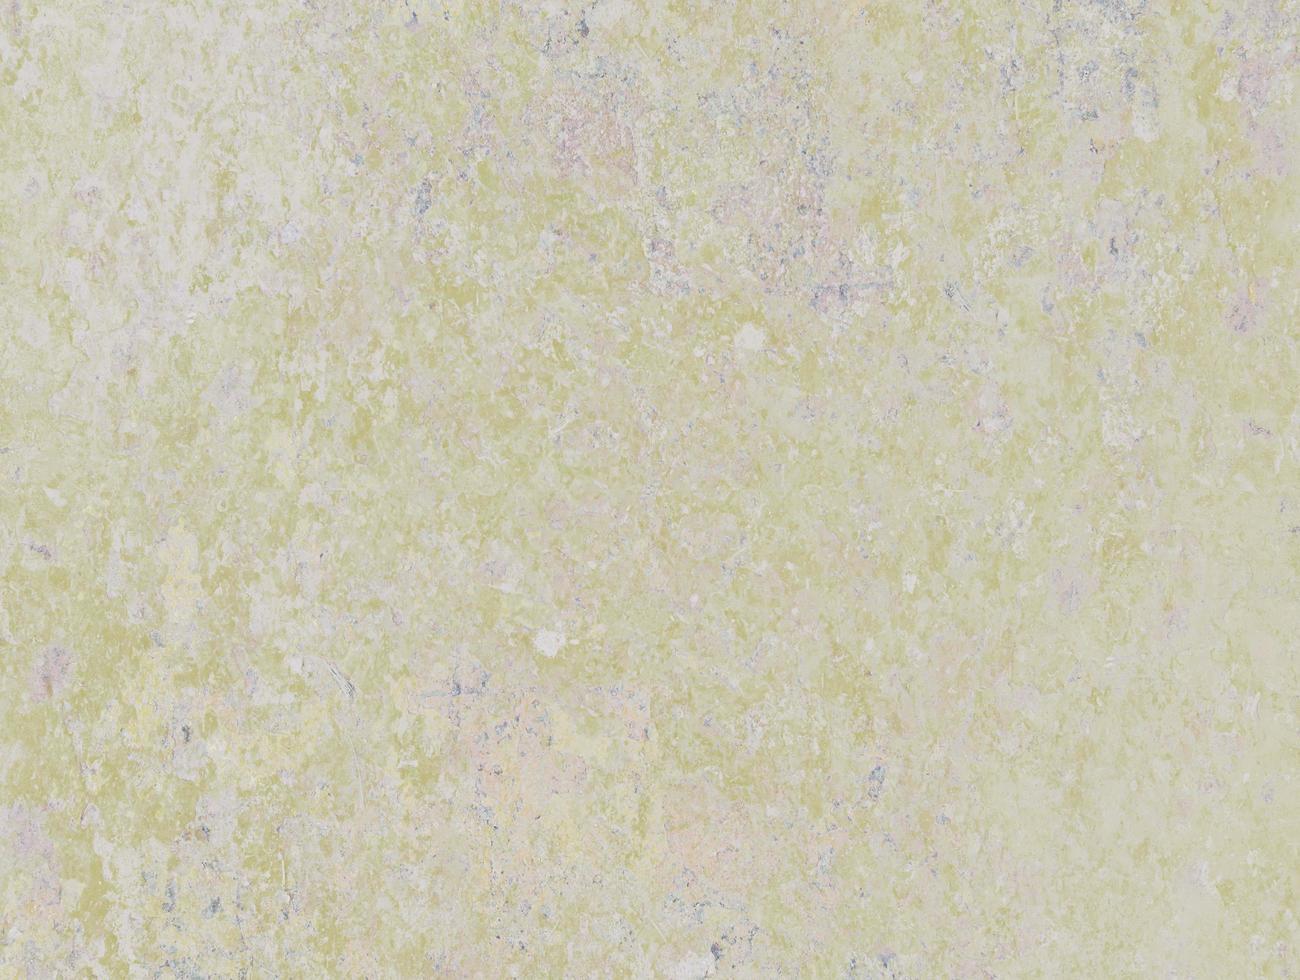 textura de pared grunge amarillo foto